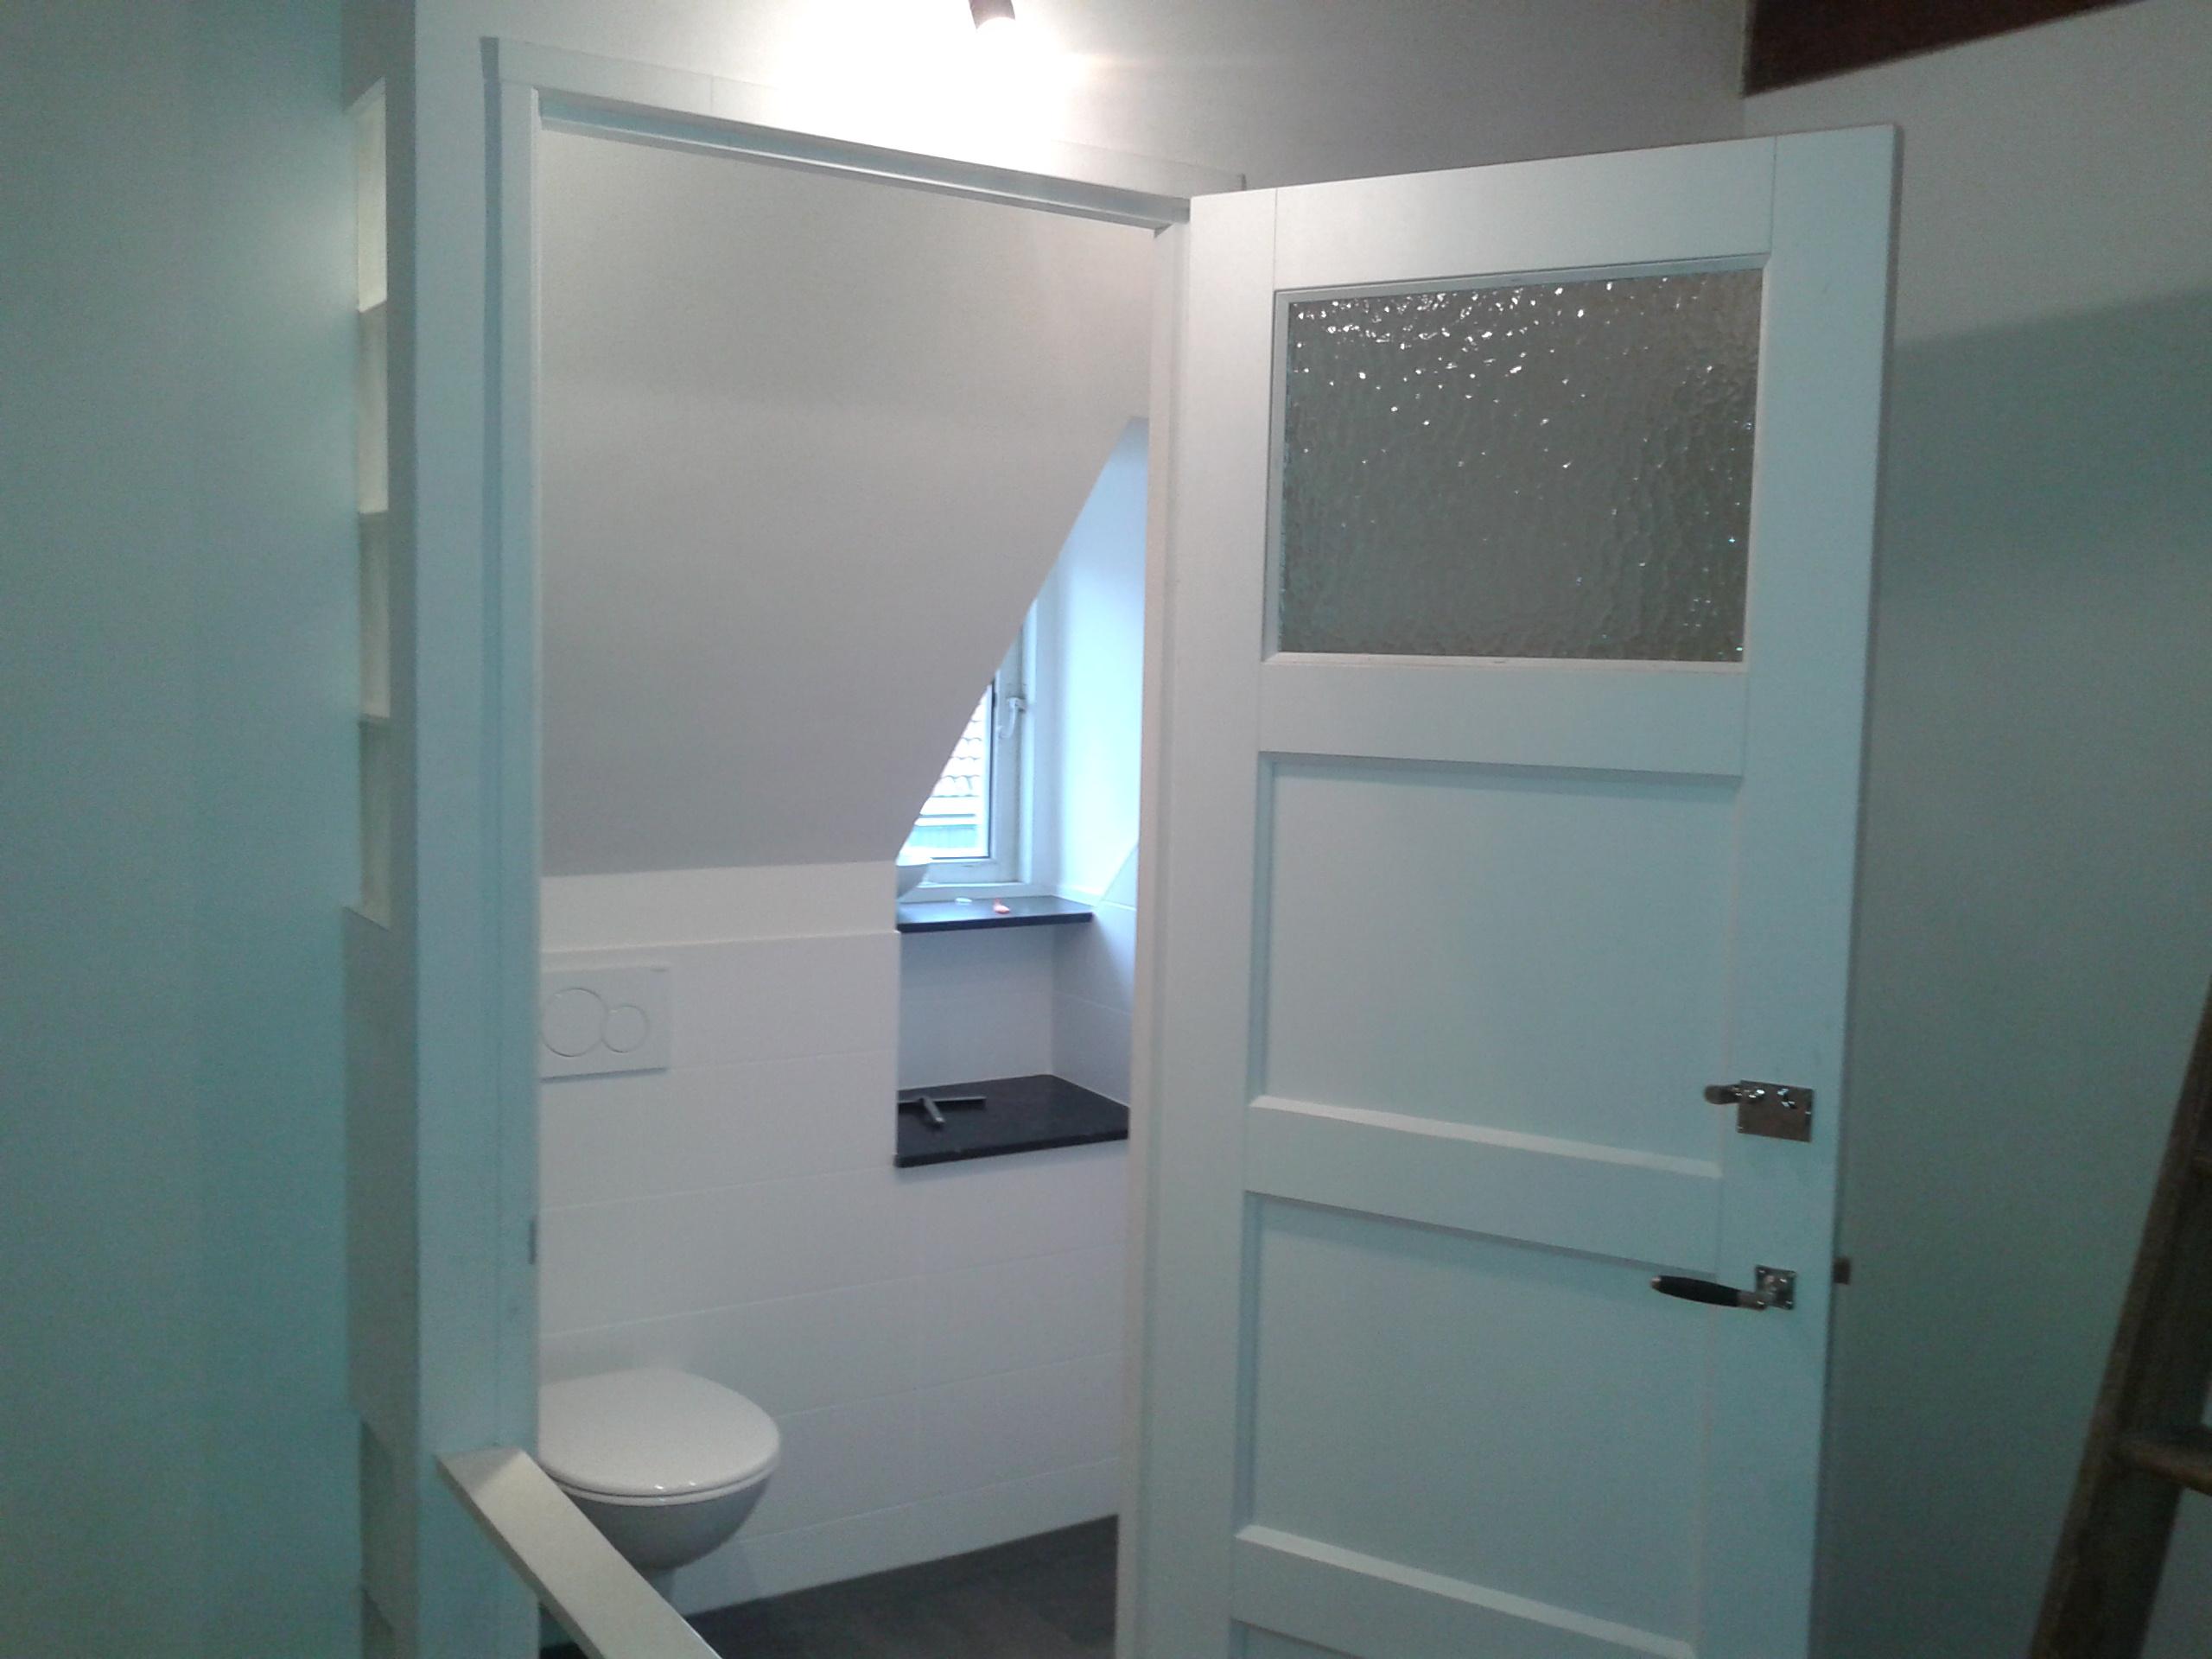 Kleine zolderkamer inrichten: zolderkamer inrichten als slaapkamer ...